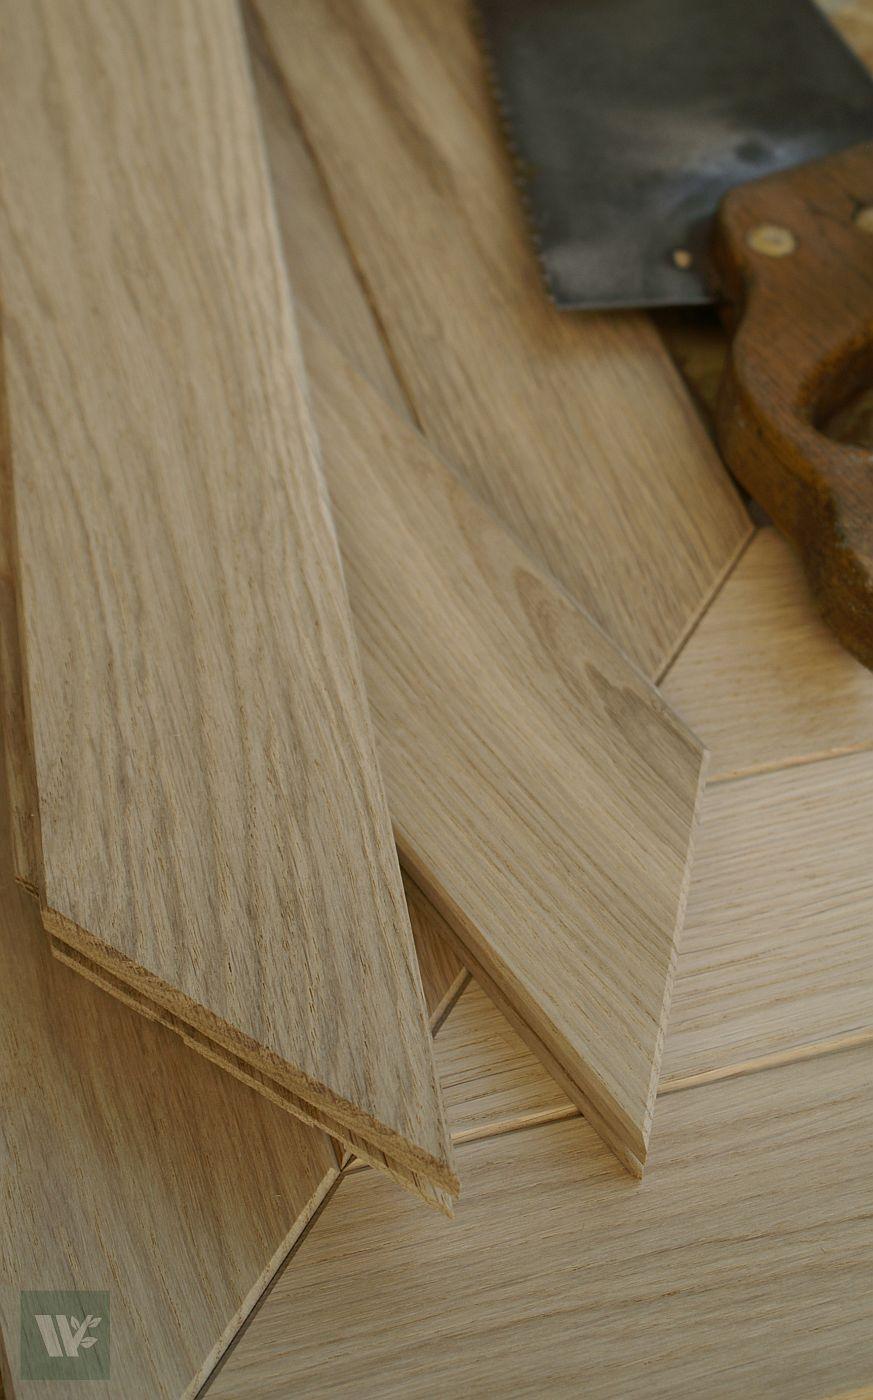 french chevron parquet solid oak 16mm high quality wood flooring hca4 ebay. Black Bedroom Furniture Sets. Home Design Ideas